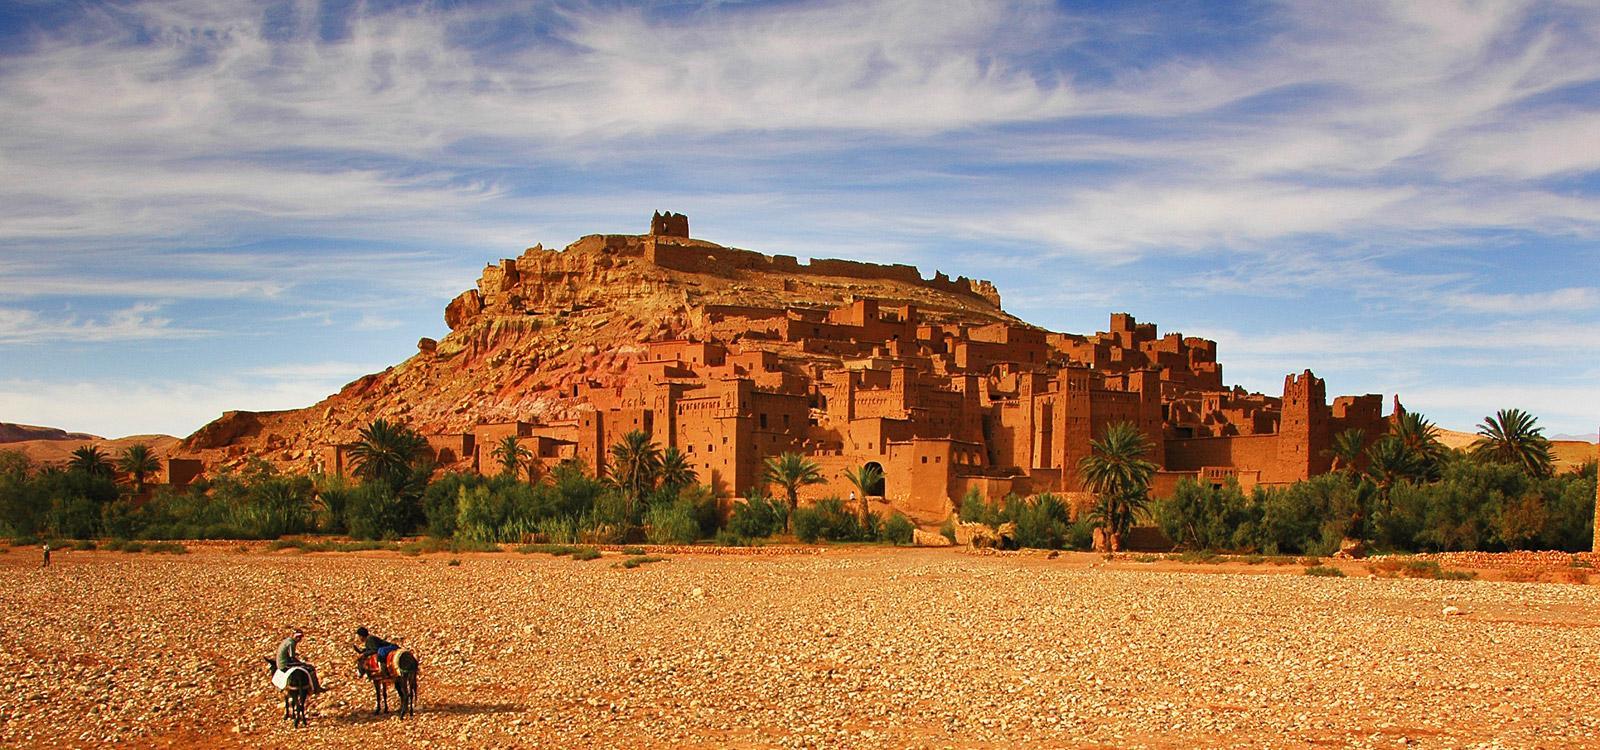 5 Days - Tour from Marrakech to sahara desert via Zagora